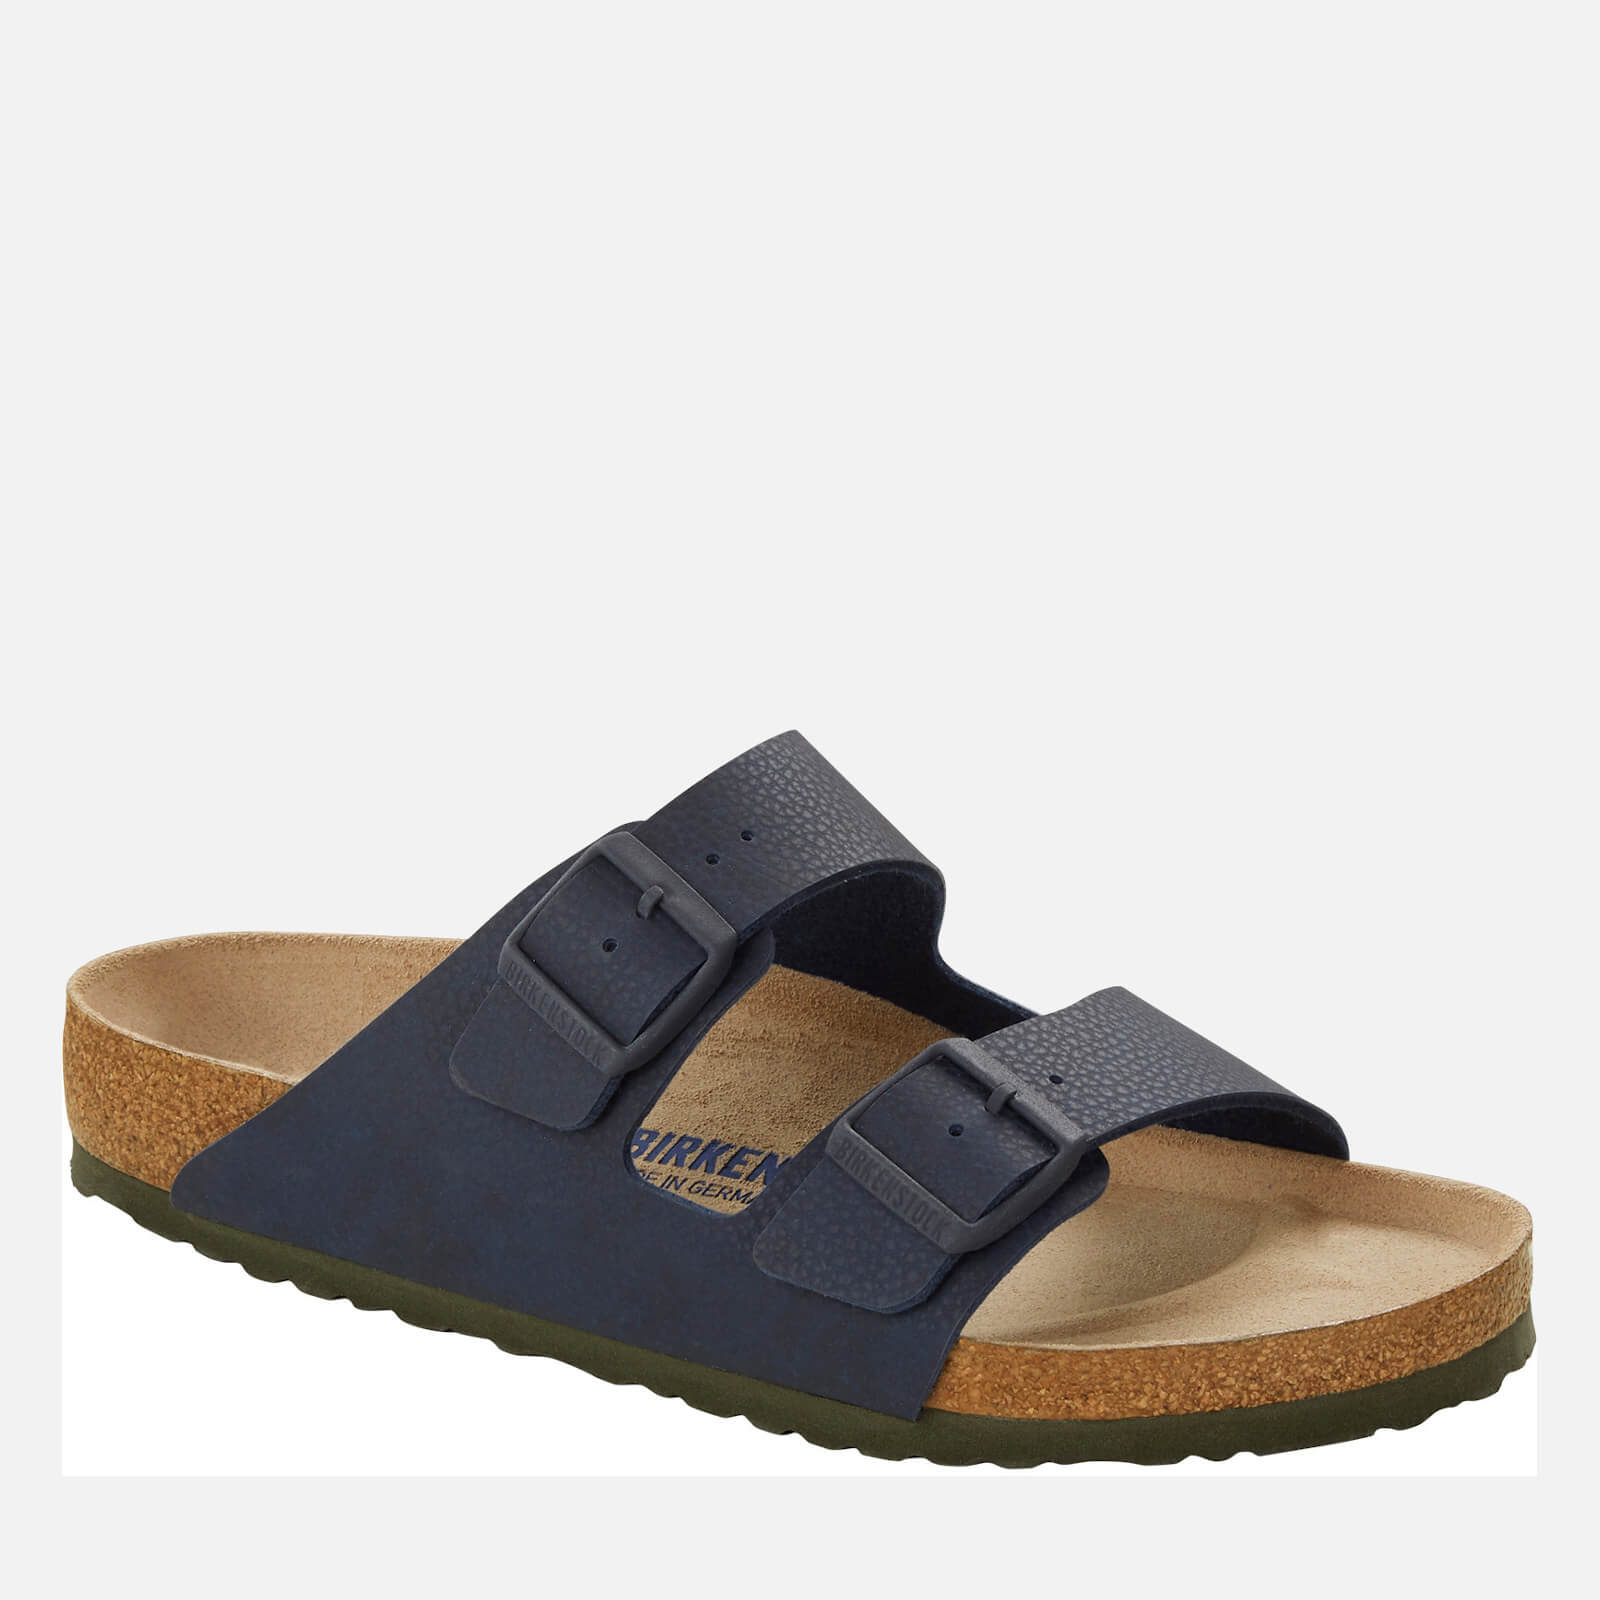 Birkenstock Mens Arizona Double Strap Sandals Desert Soil Blue Eu 40 Uk 7